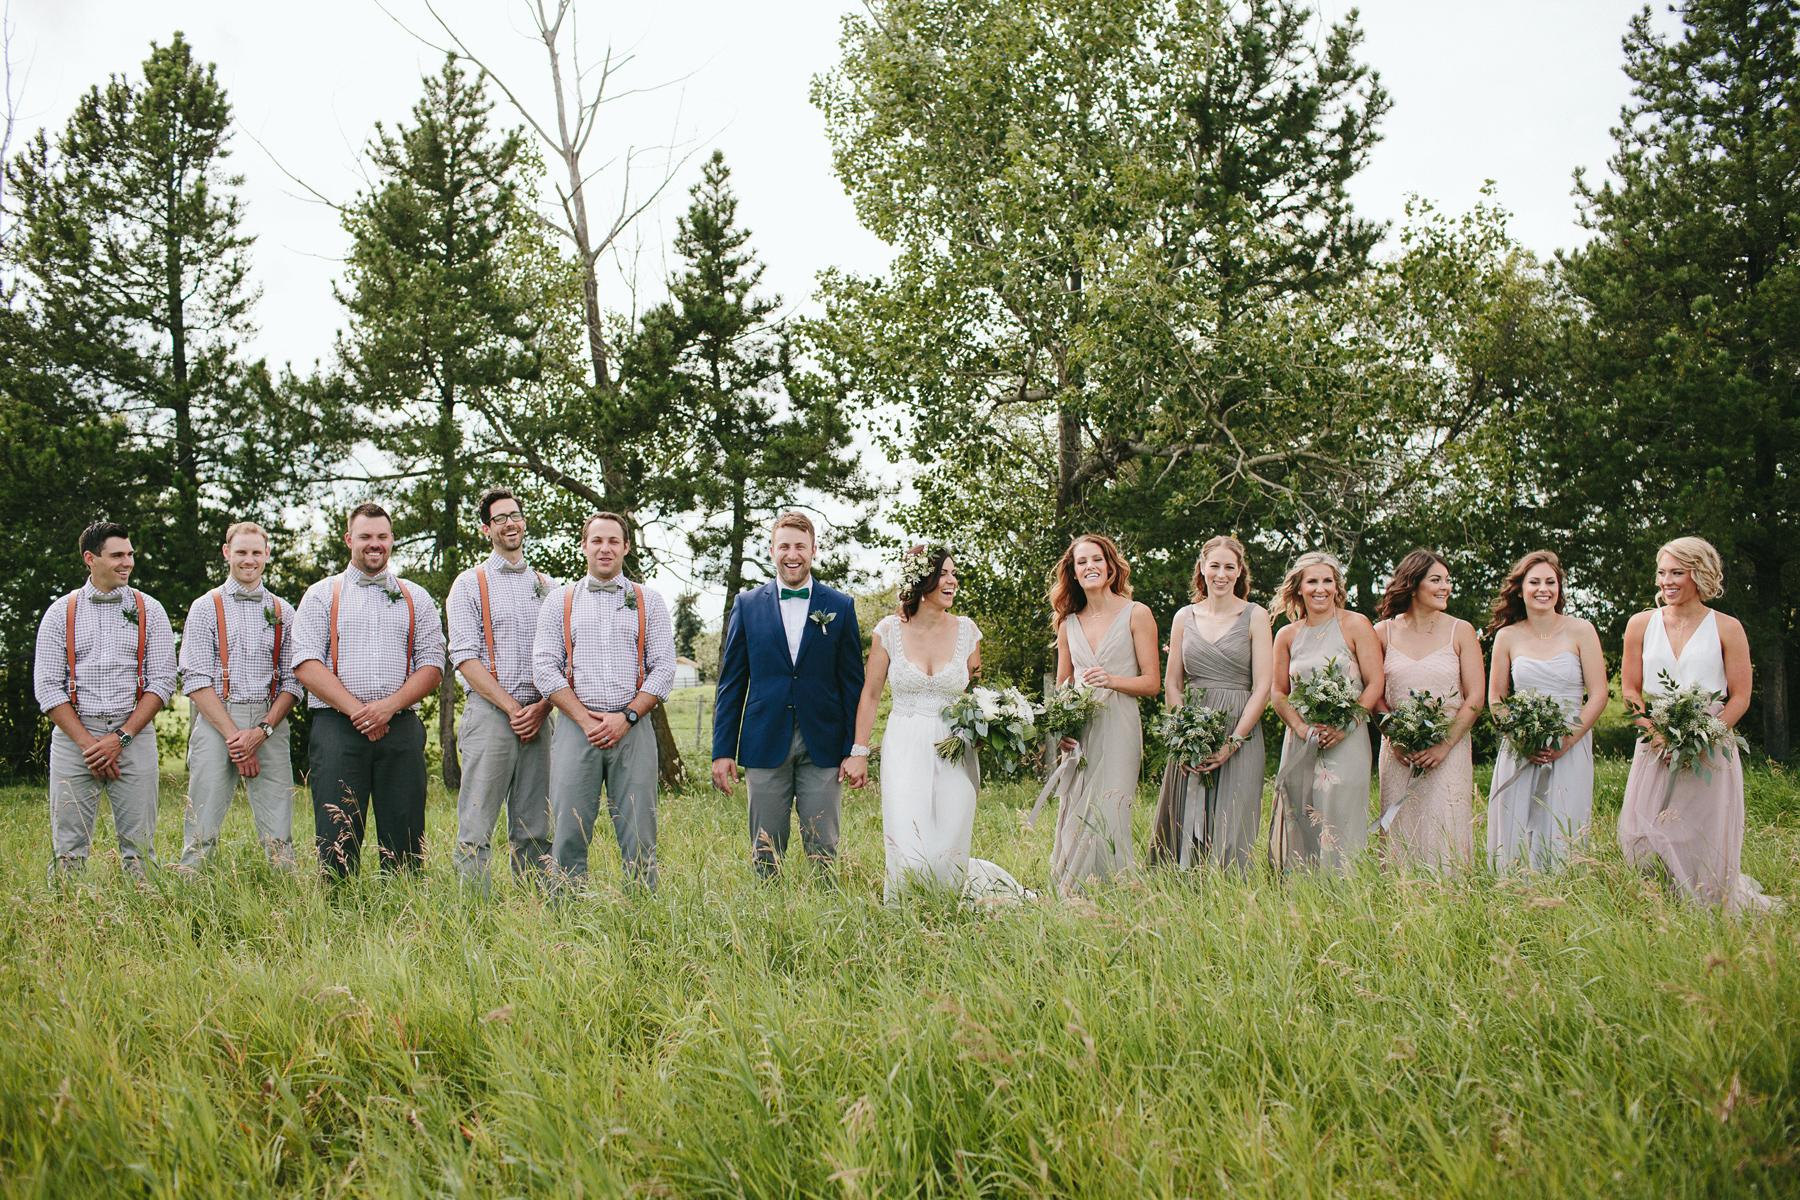 alberta-farm-wedding-photographer-rp-wj-062.jpg